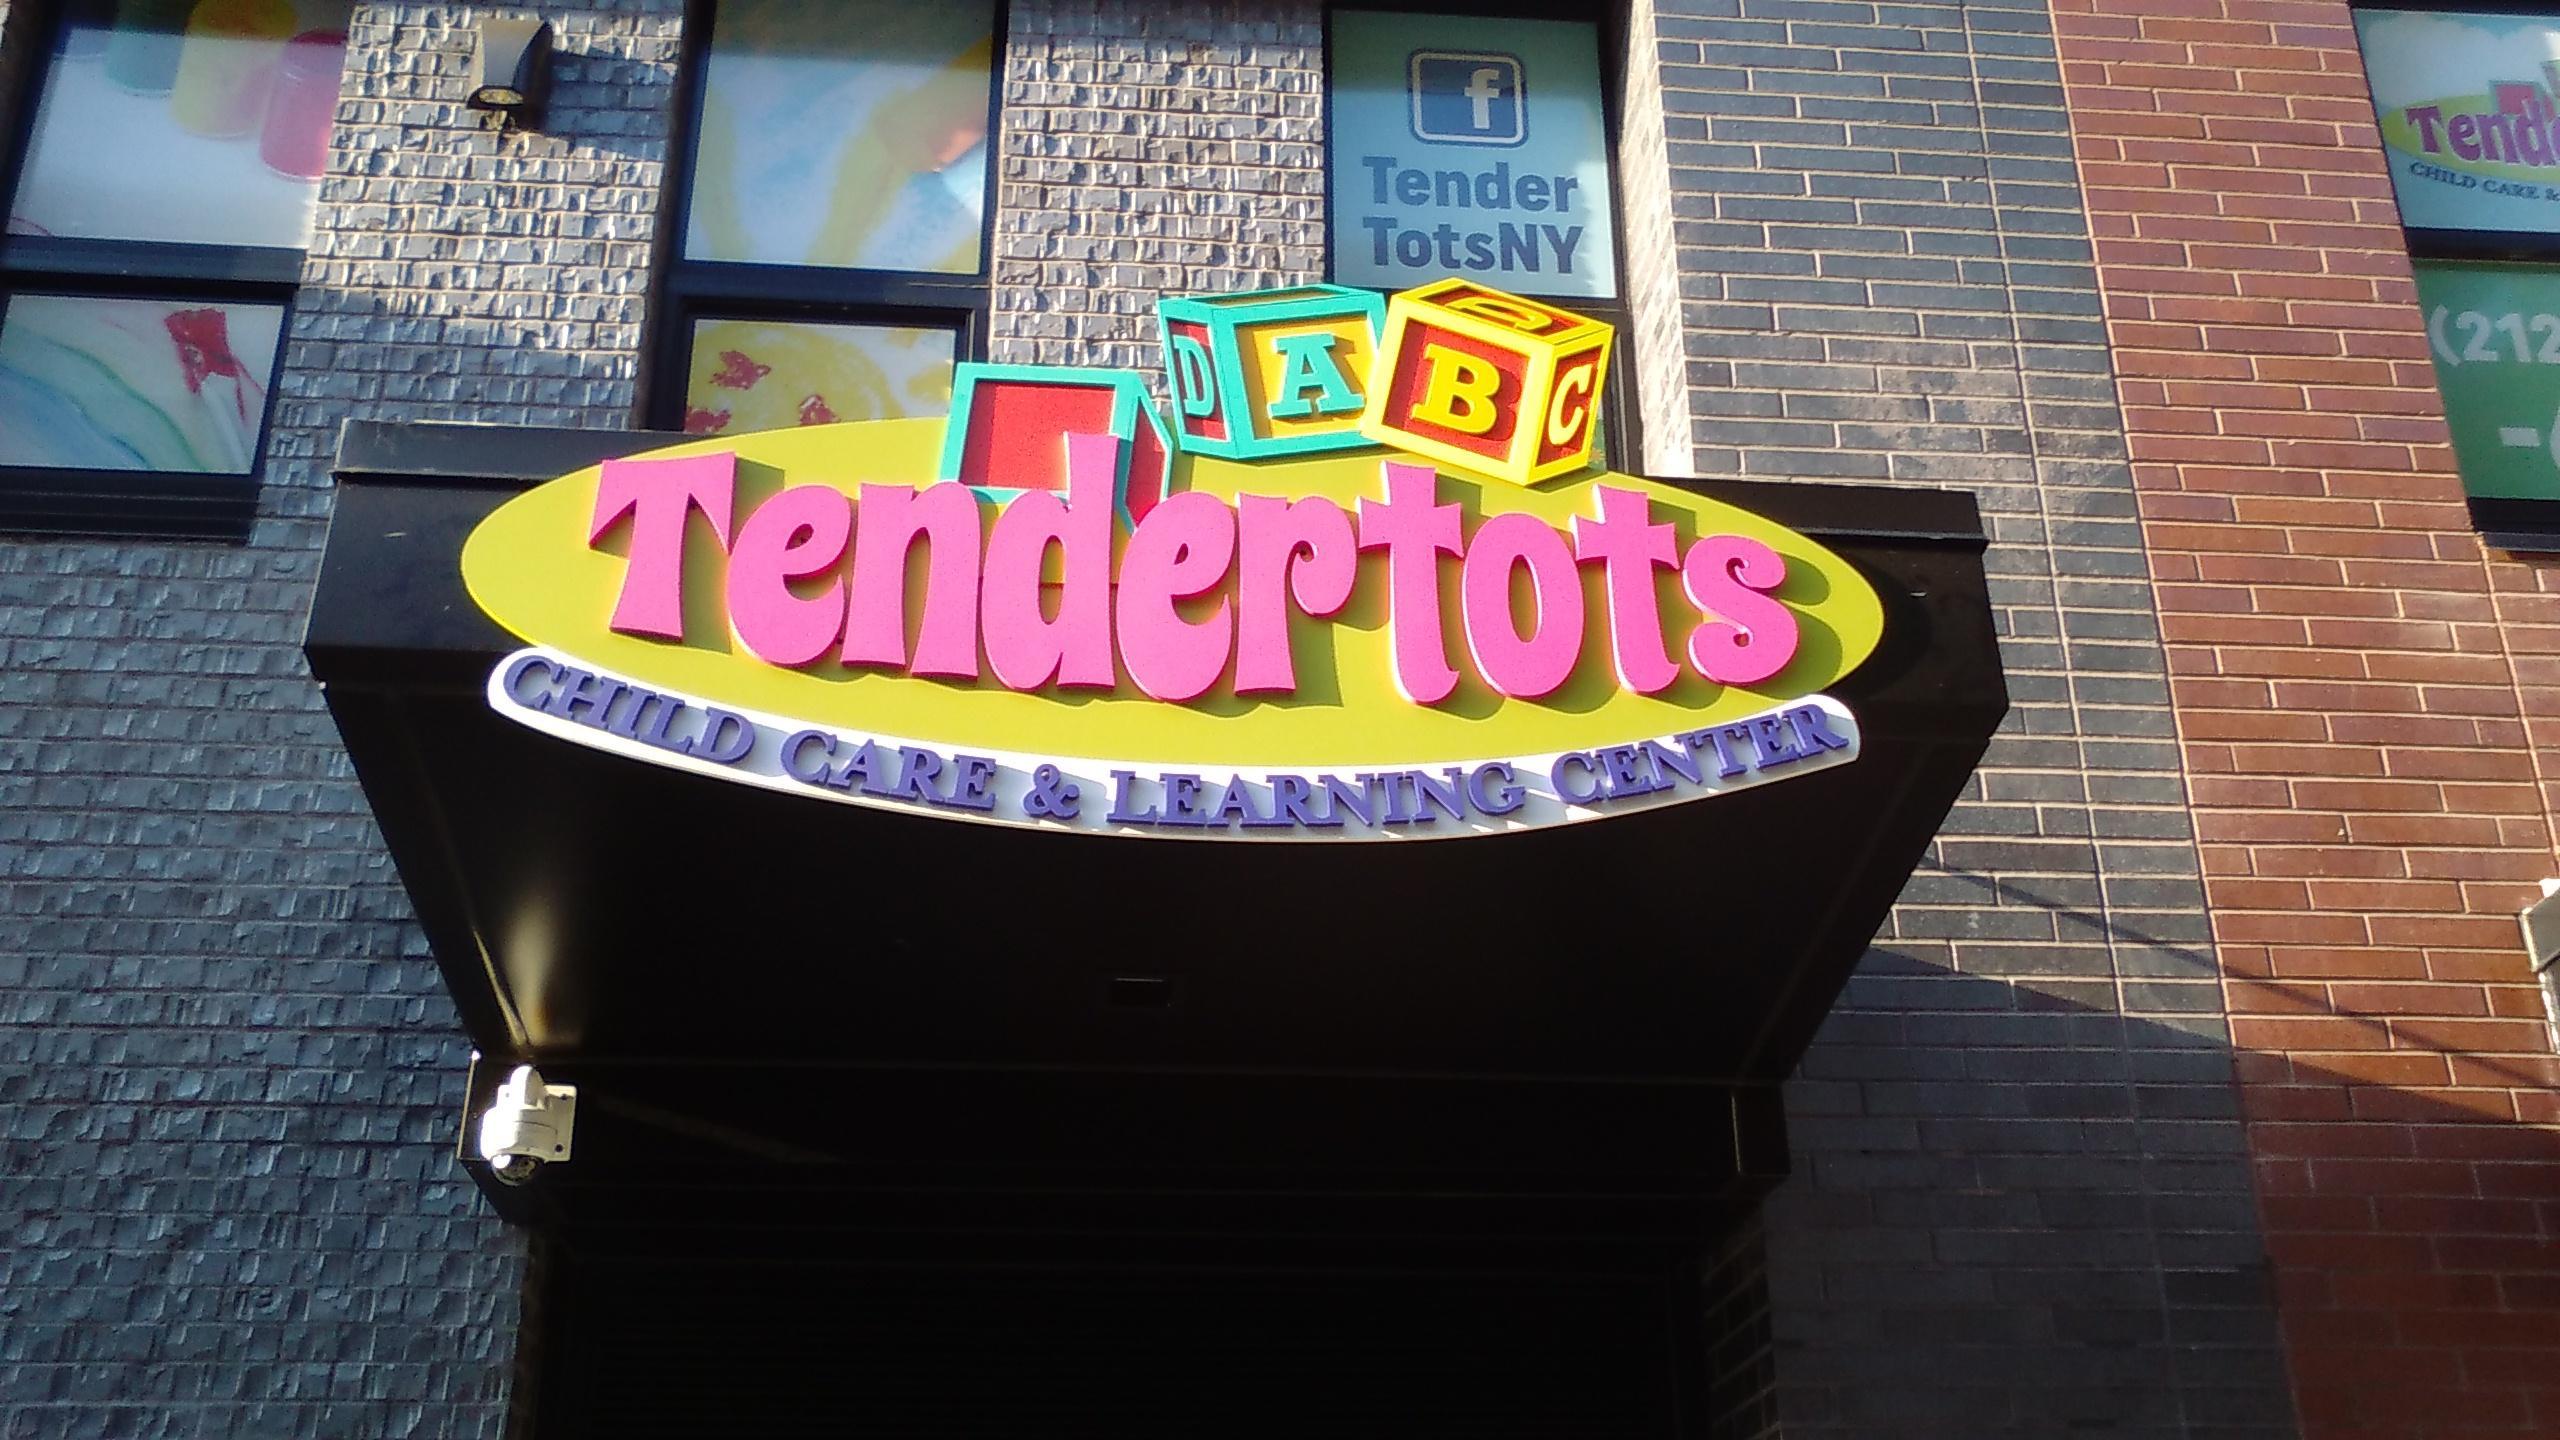 Tendertots